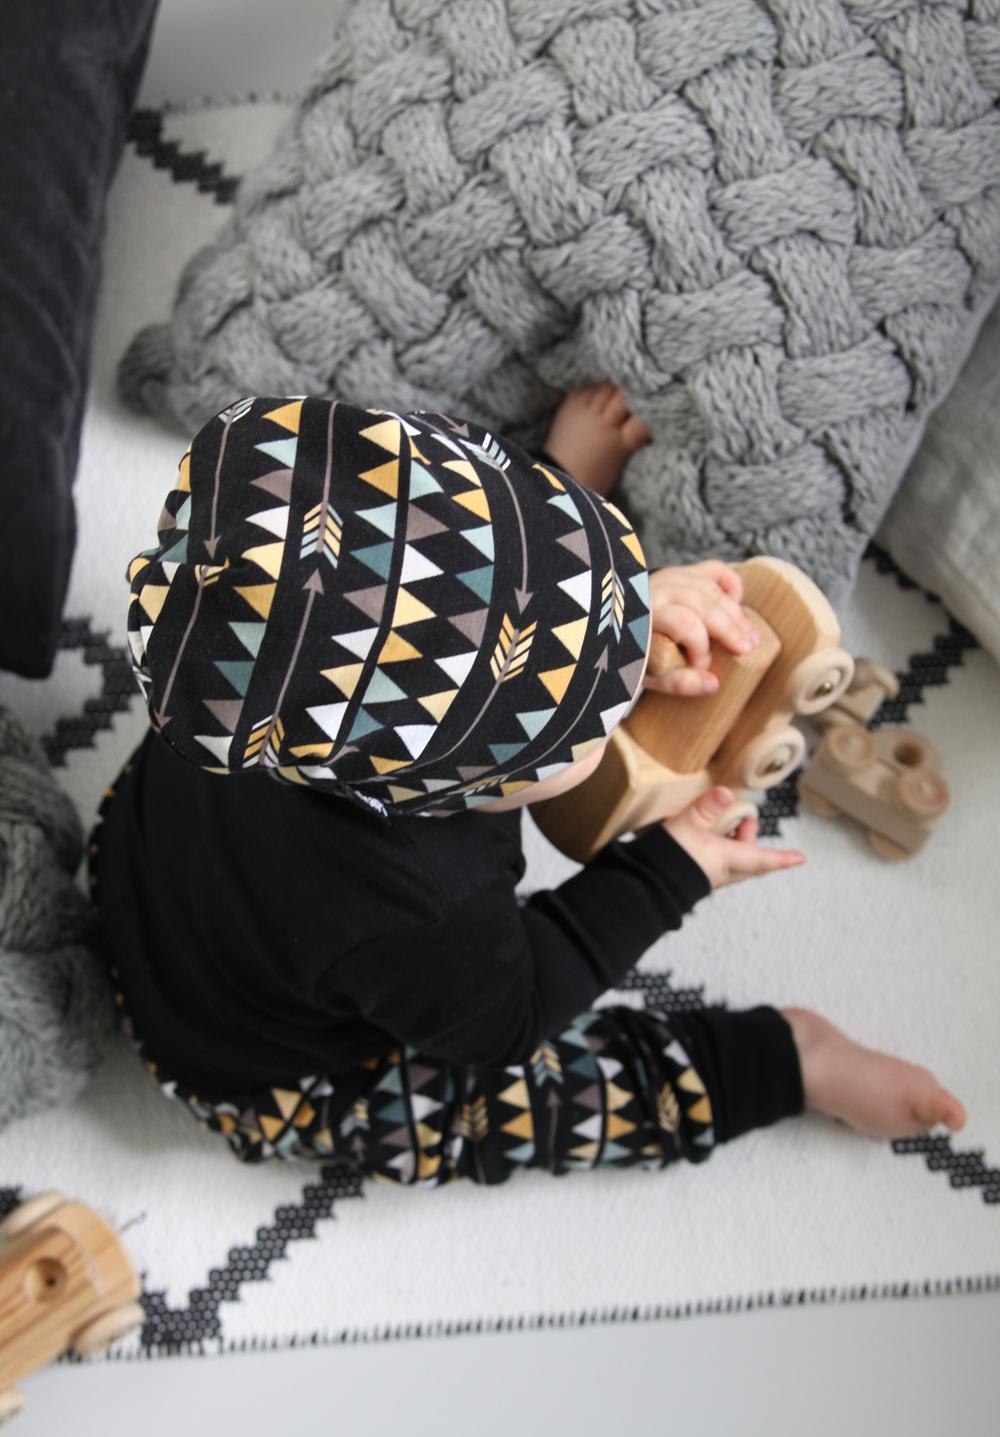 kikapi lastenvaatteet vaatteet vauva